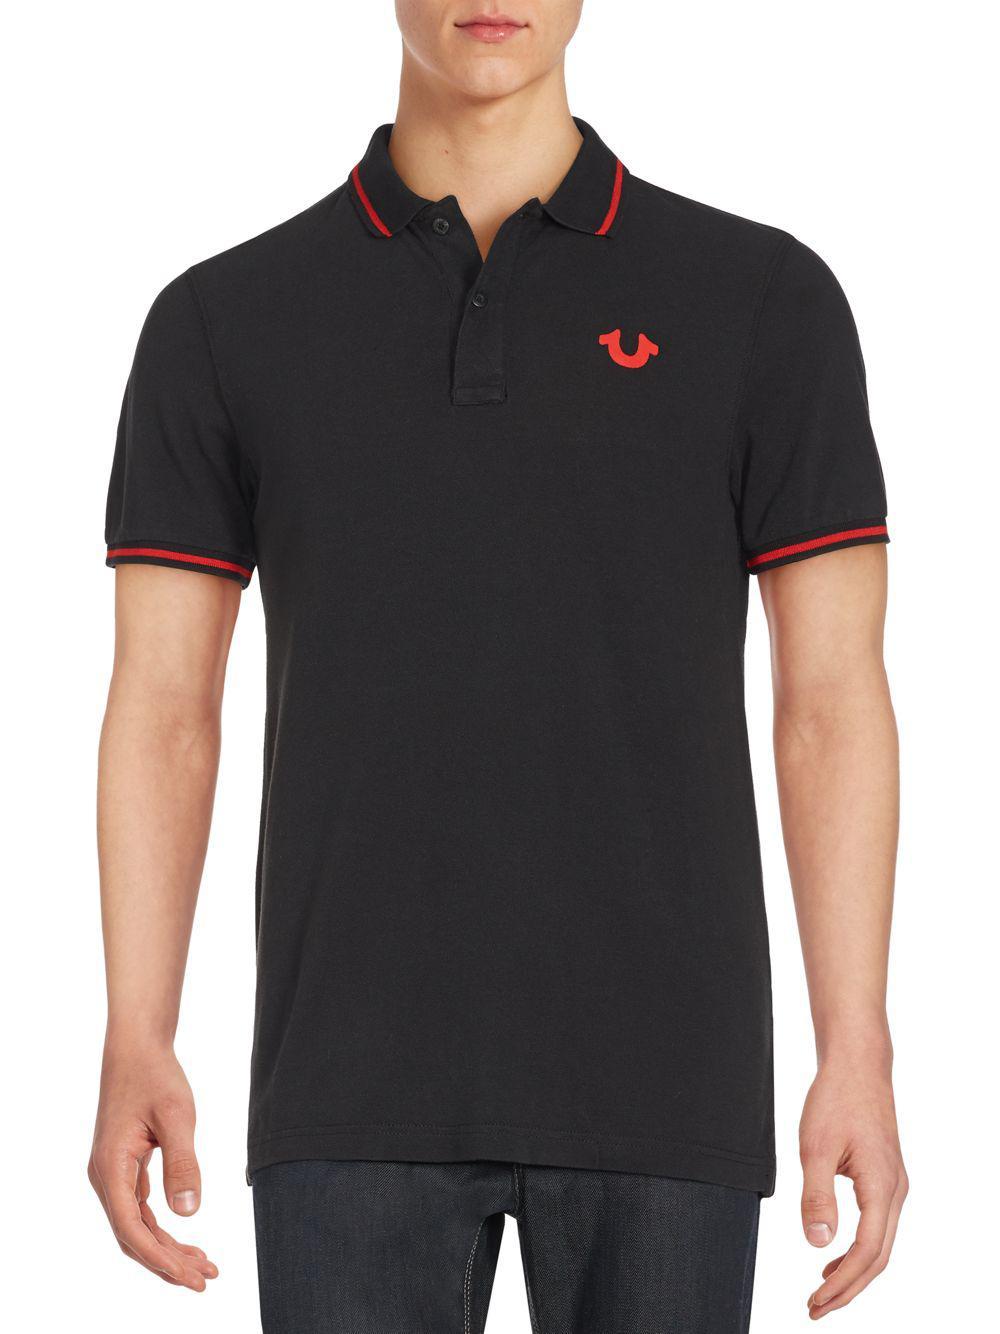 Lyst True Religion Signature Print Polo Shirt In Black For Men